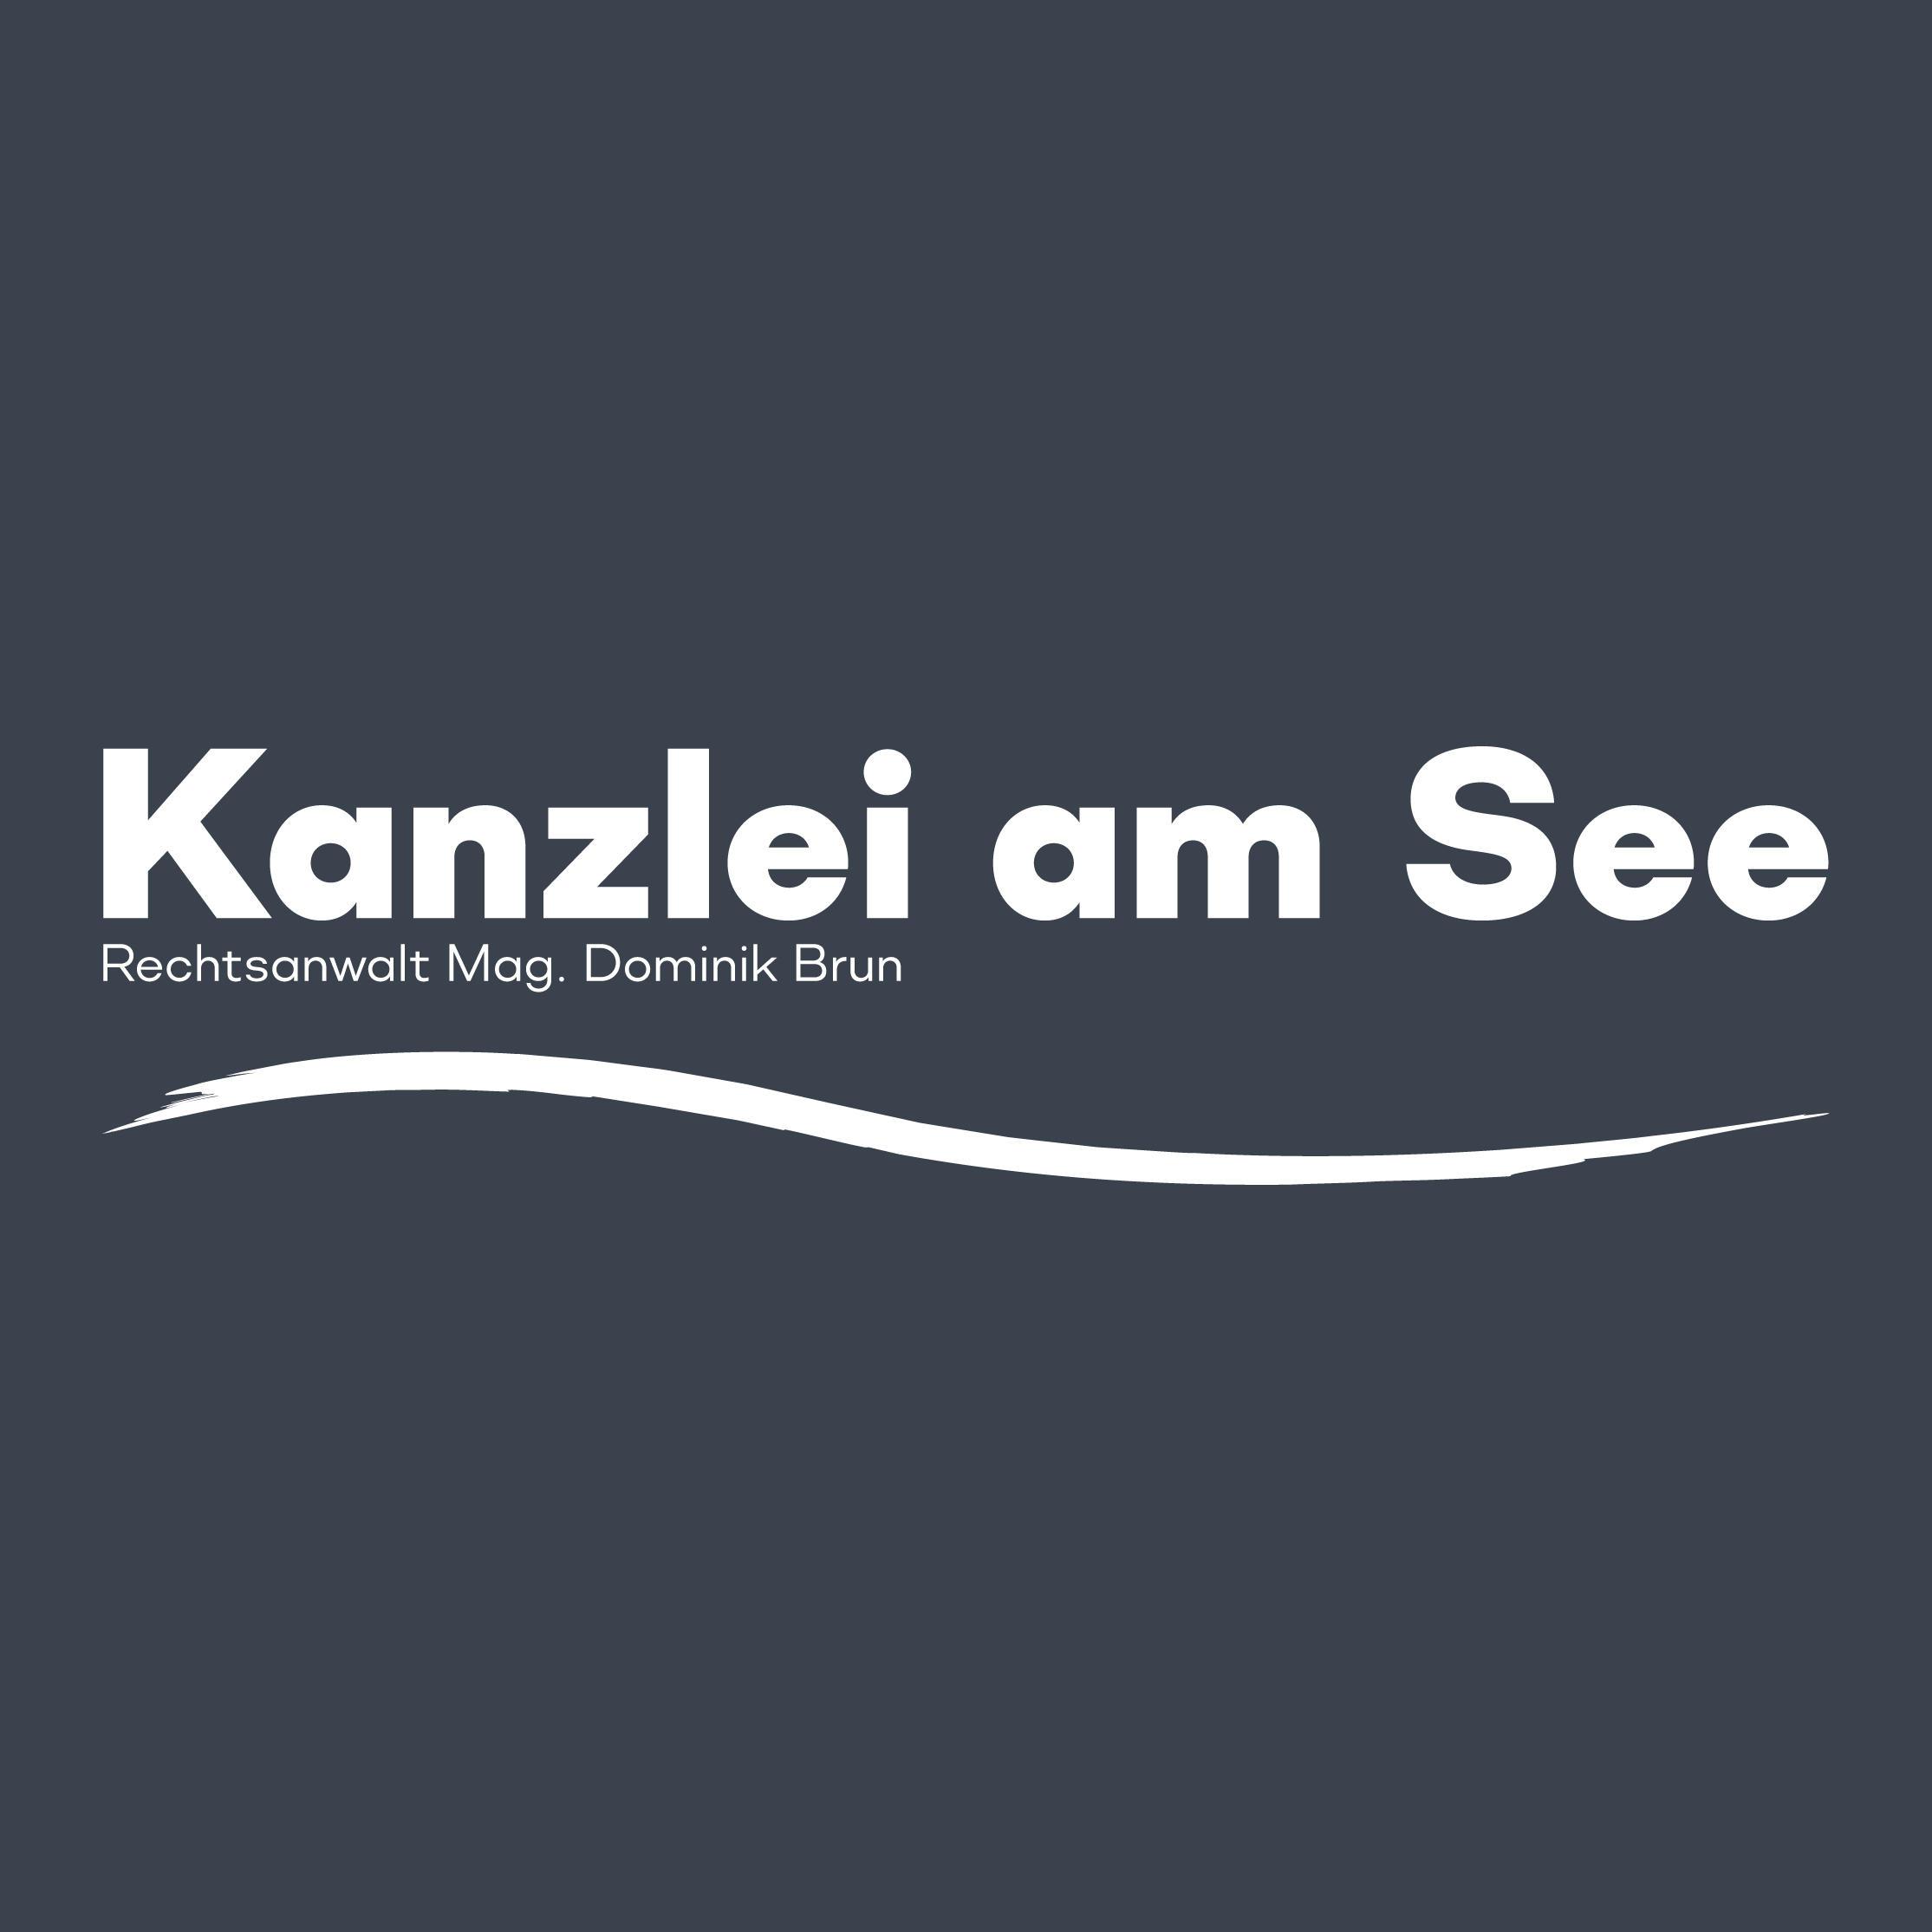 Rechtsanwalt Mag. Dominik Brun - Kanzlei am See Logo